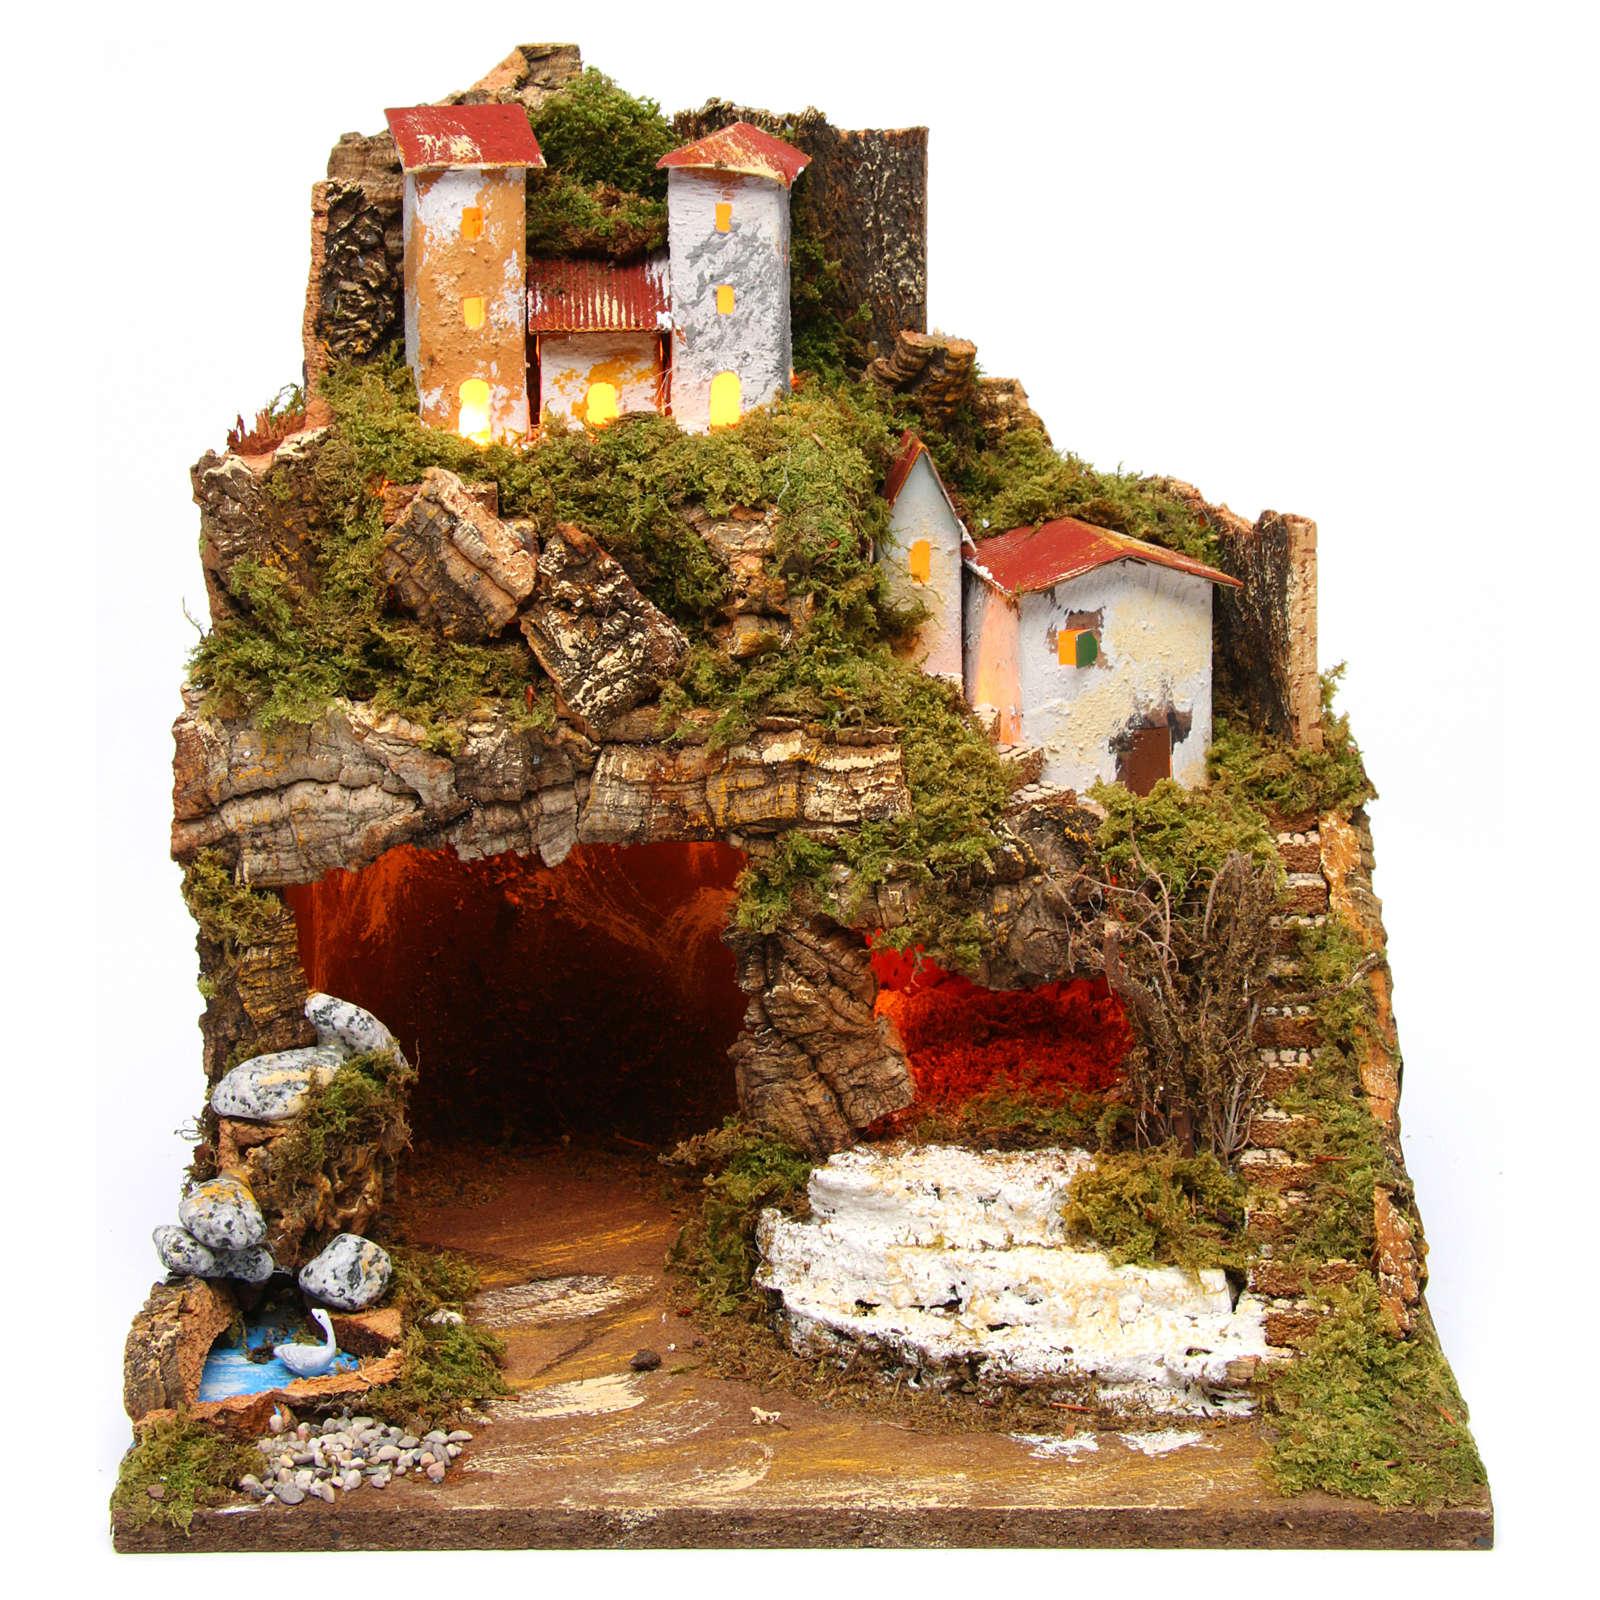 Capanna borgo presepe 8-10 cm luci 35x33x30 cm 4